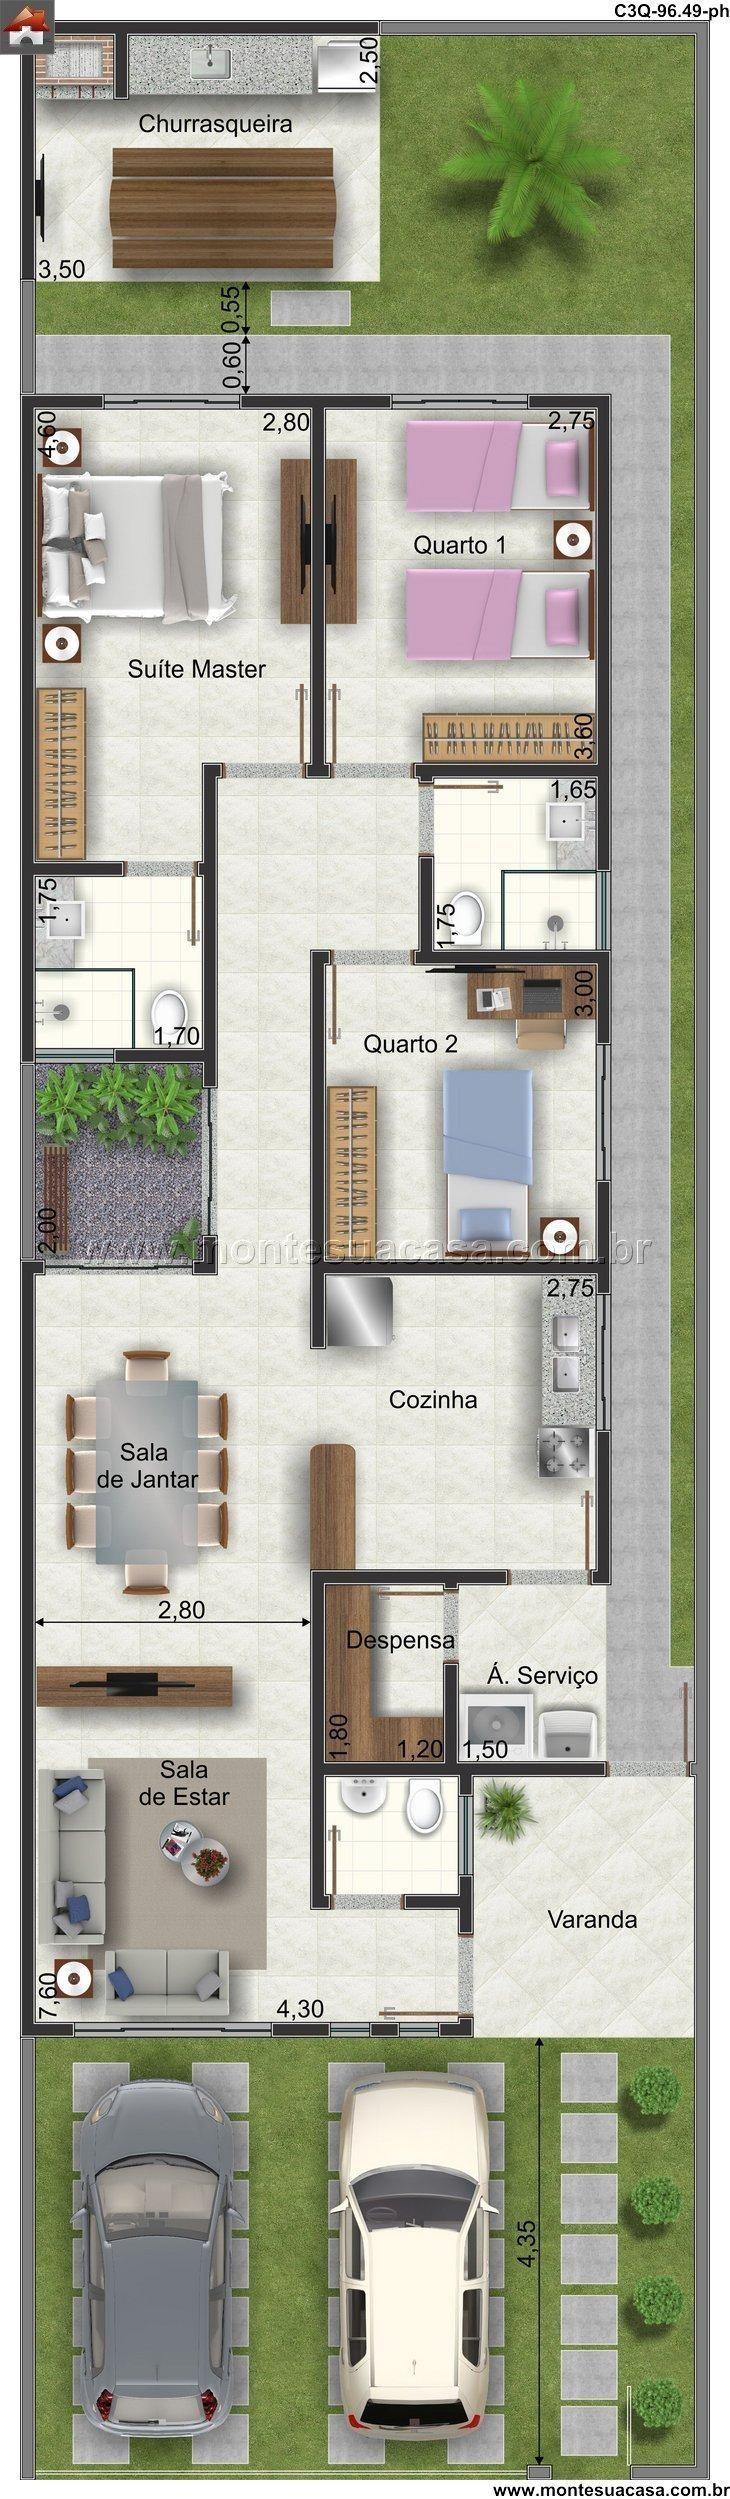 147 Excellent Modern House Plan Designs Free Download  Https://www.futuristarchitecture.com/4516 Modern House Plans.html #houseplan